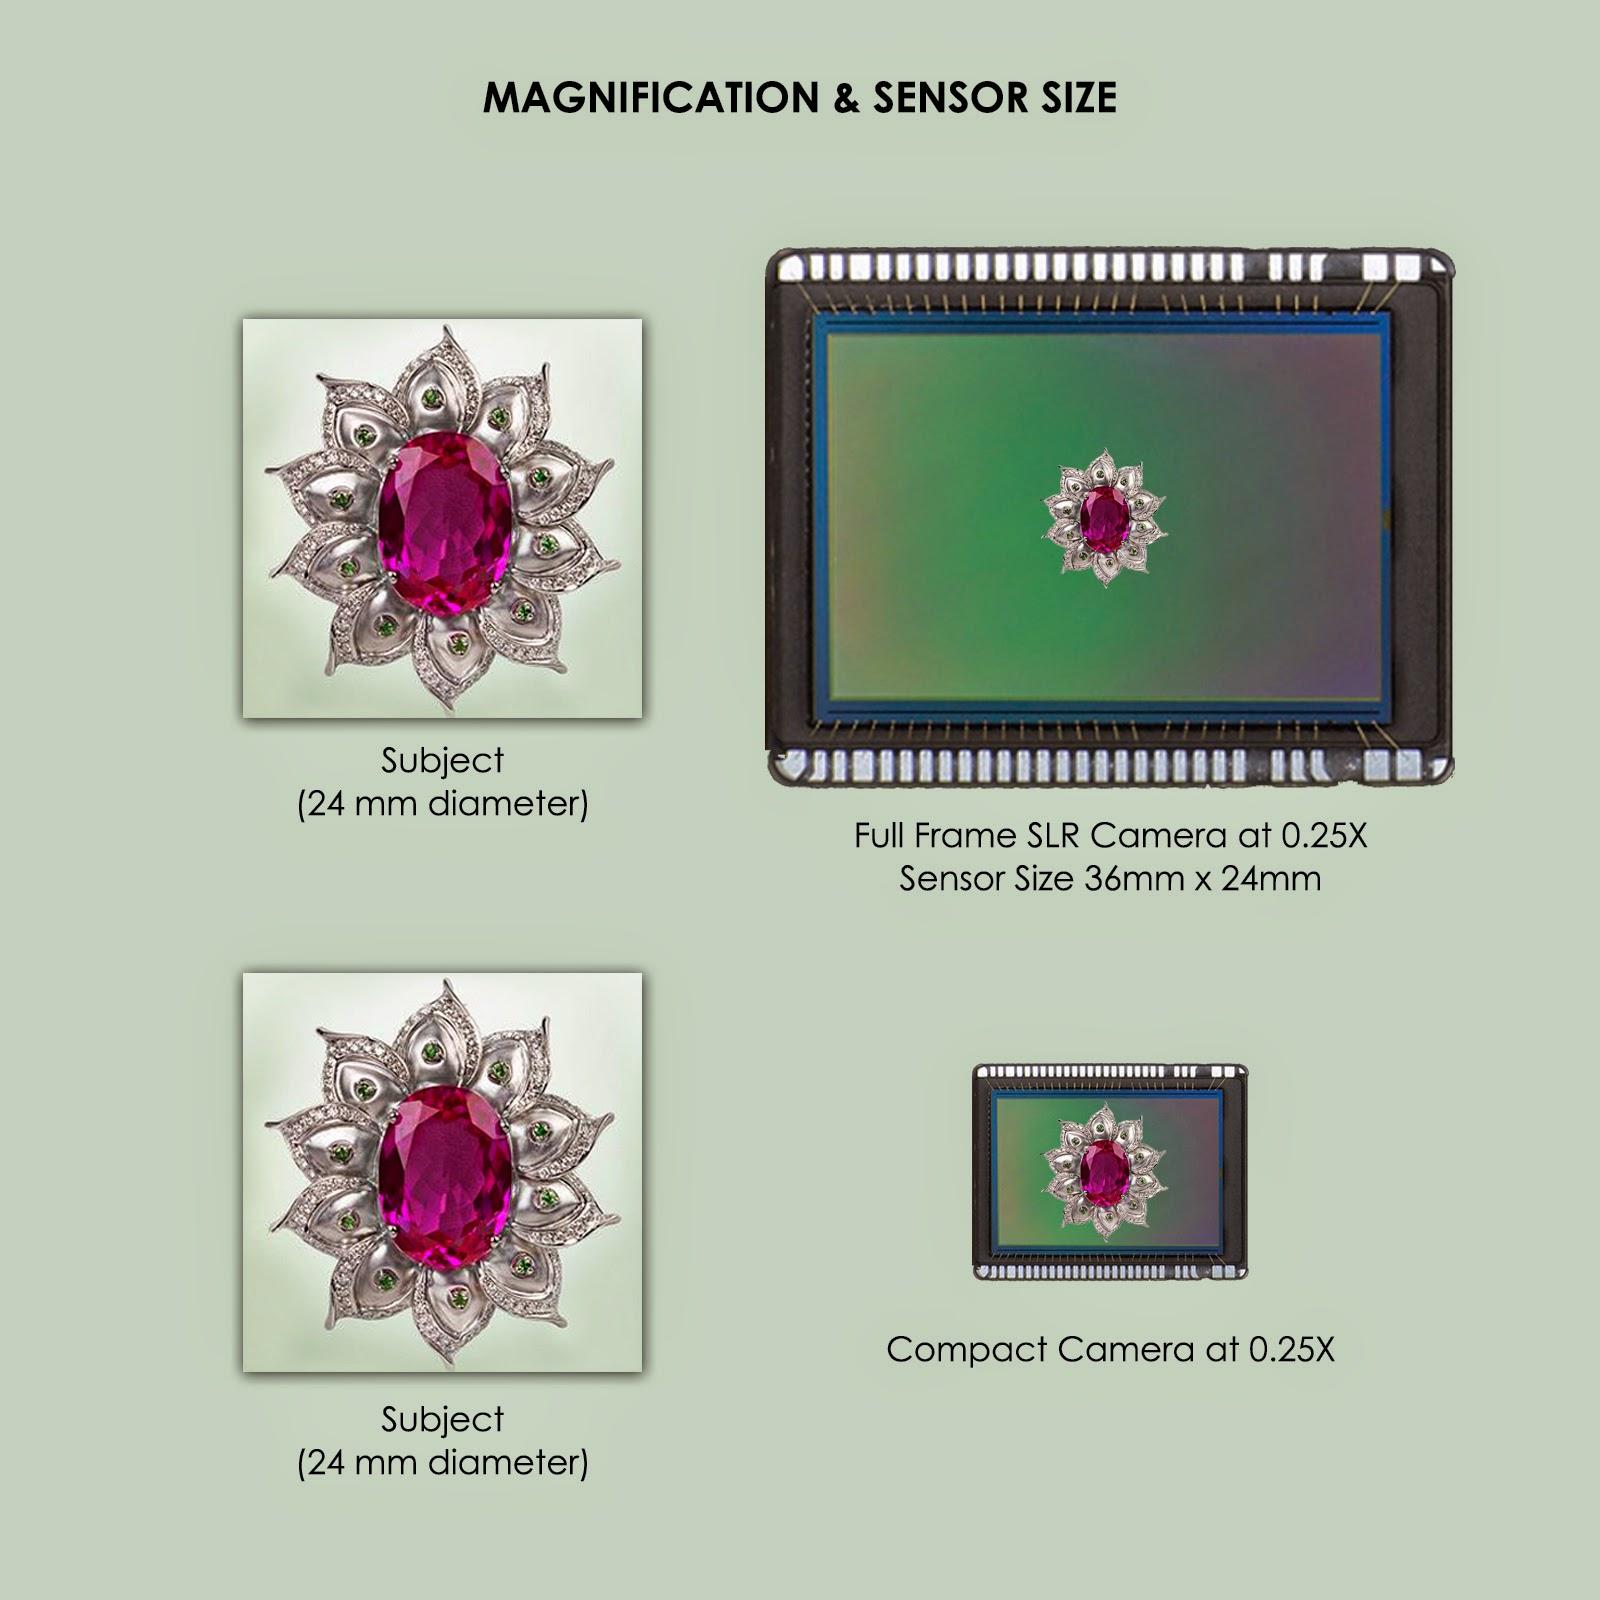 macro photography magnification and sensor size